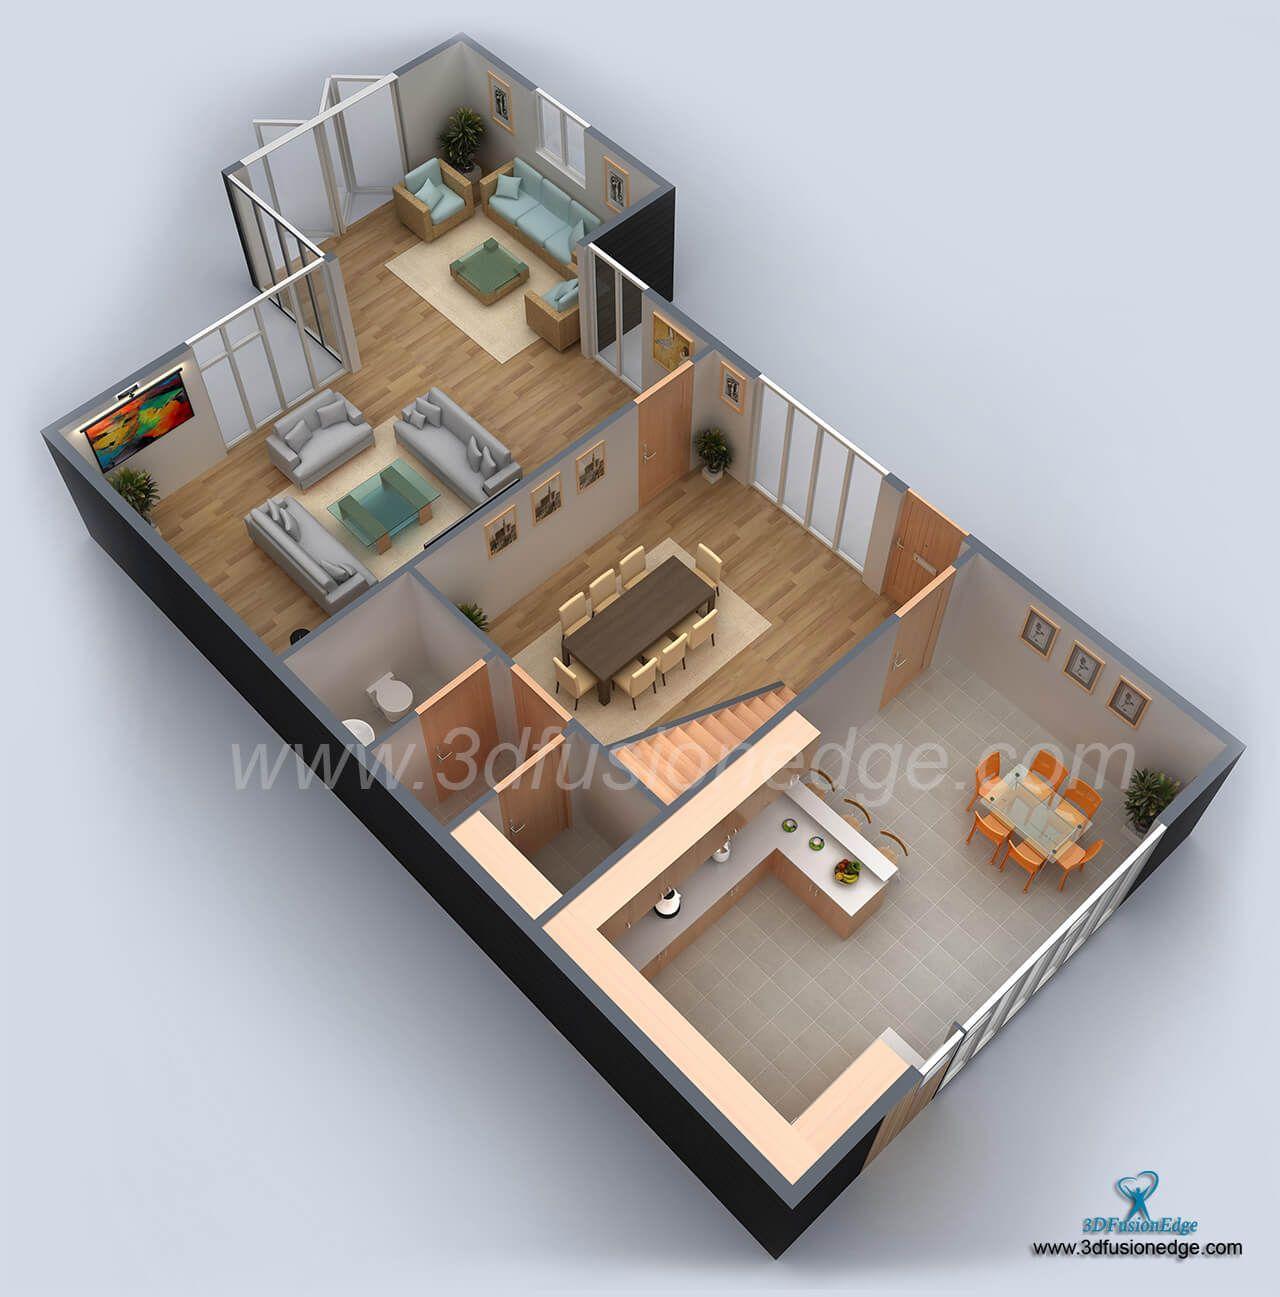 3d Floor Plan Virtual Presentation Architectural Floor Plans Floor Plans Sims House Design